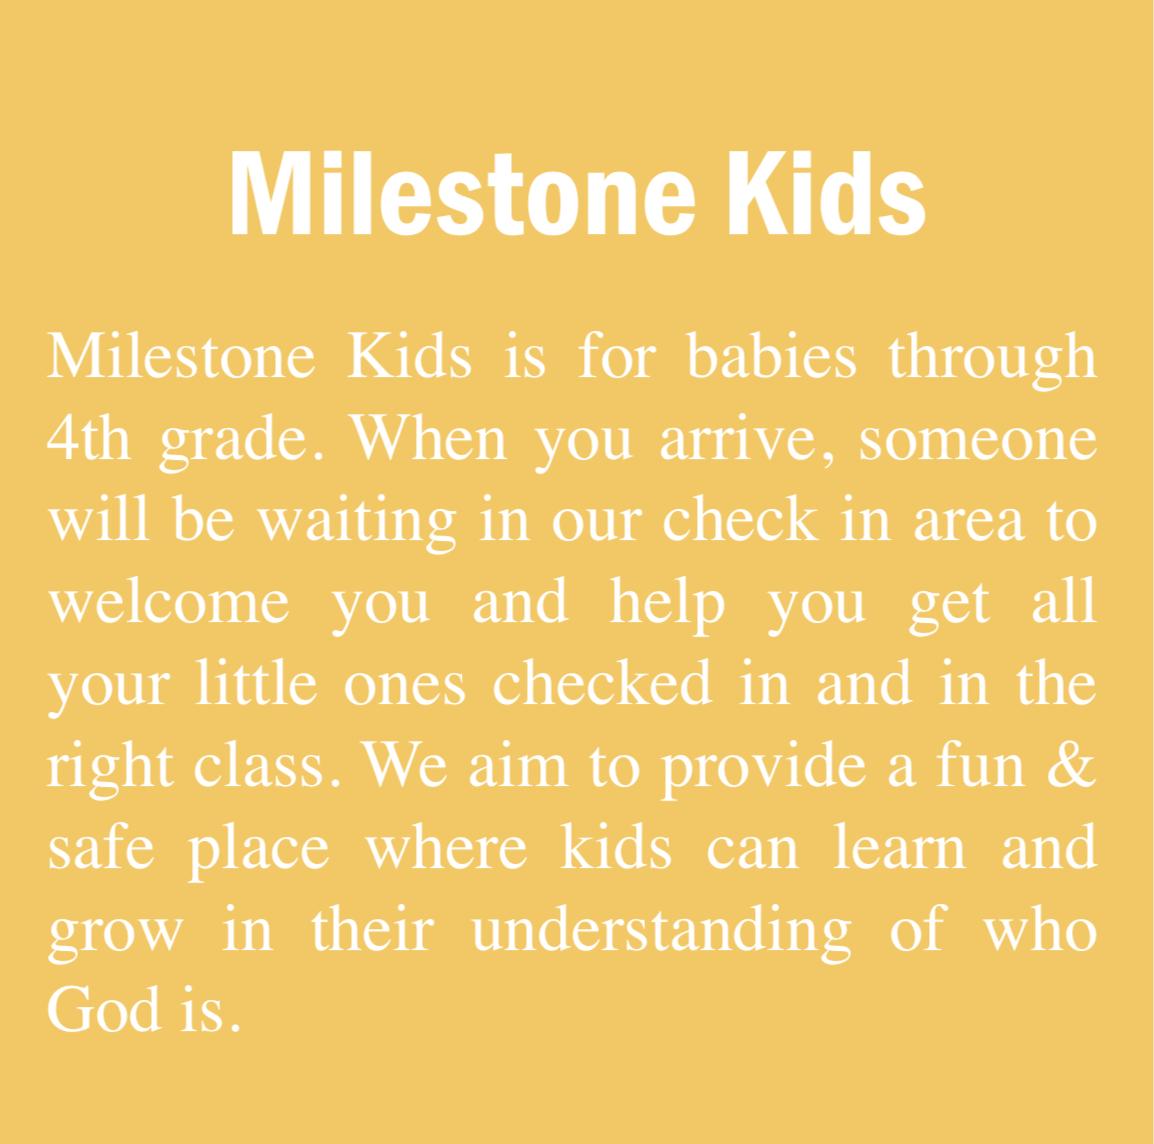 milestonekids.png